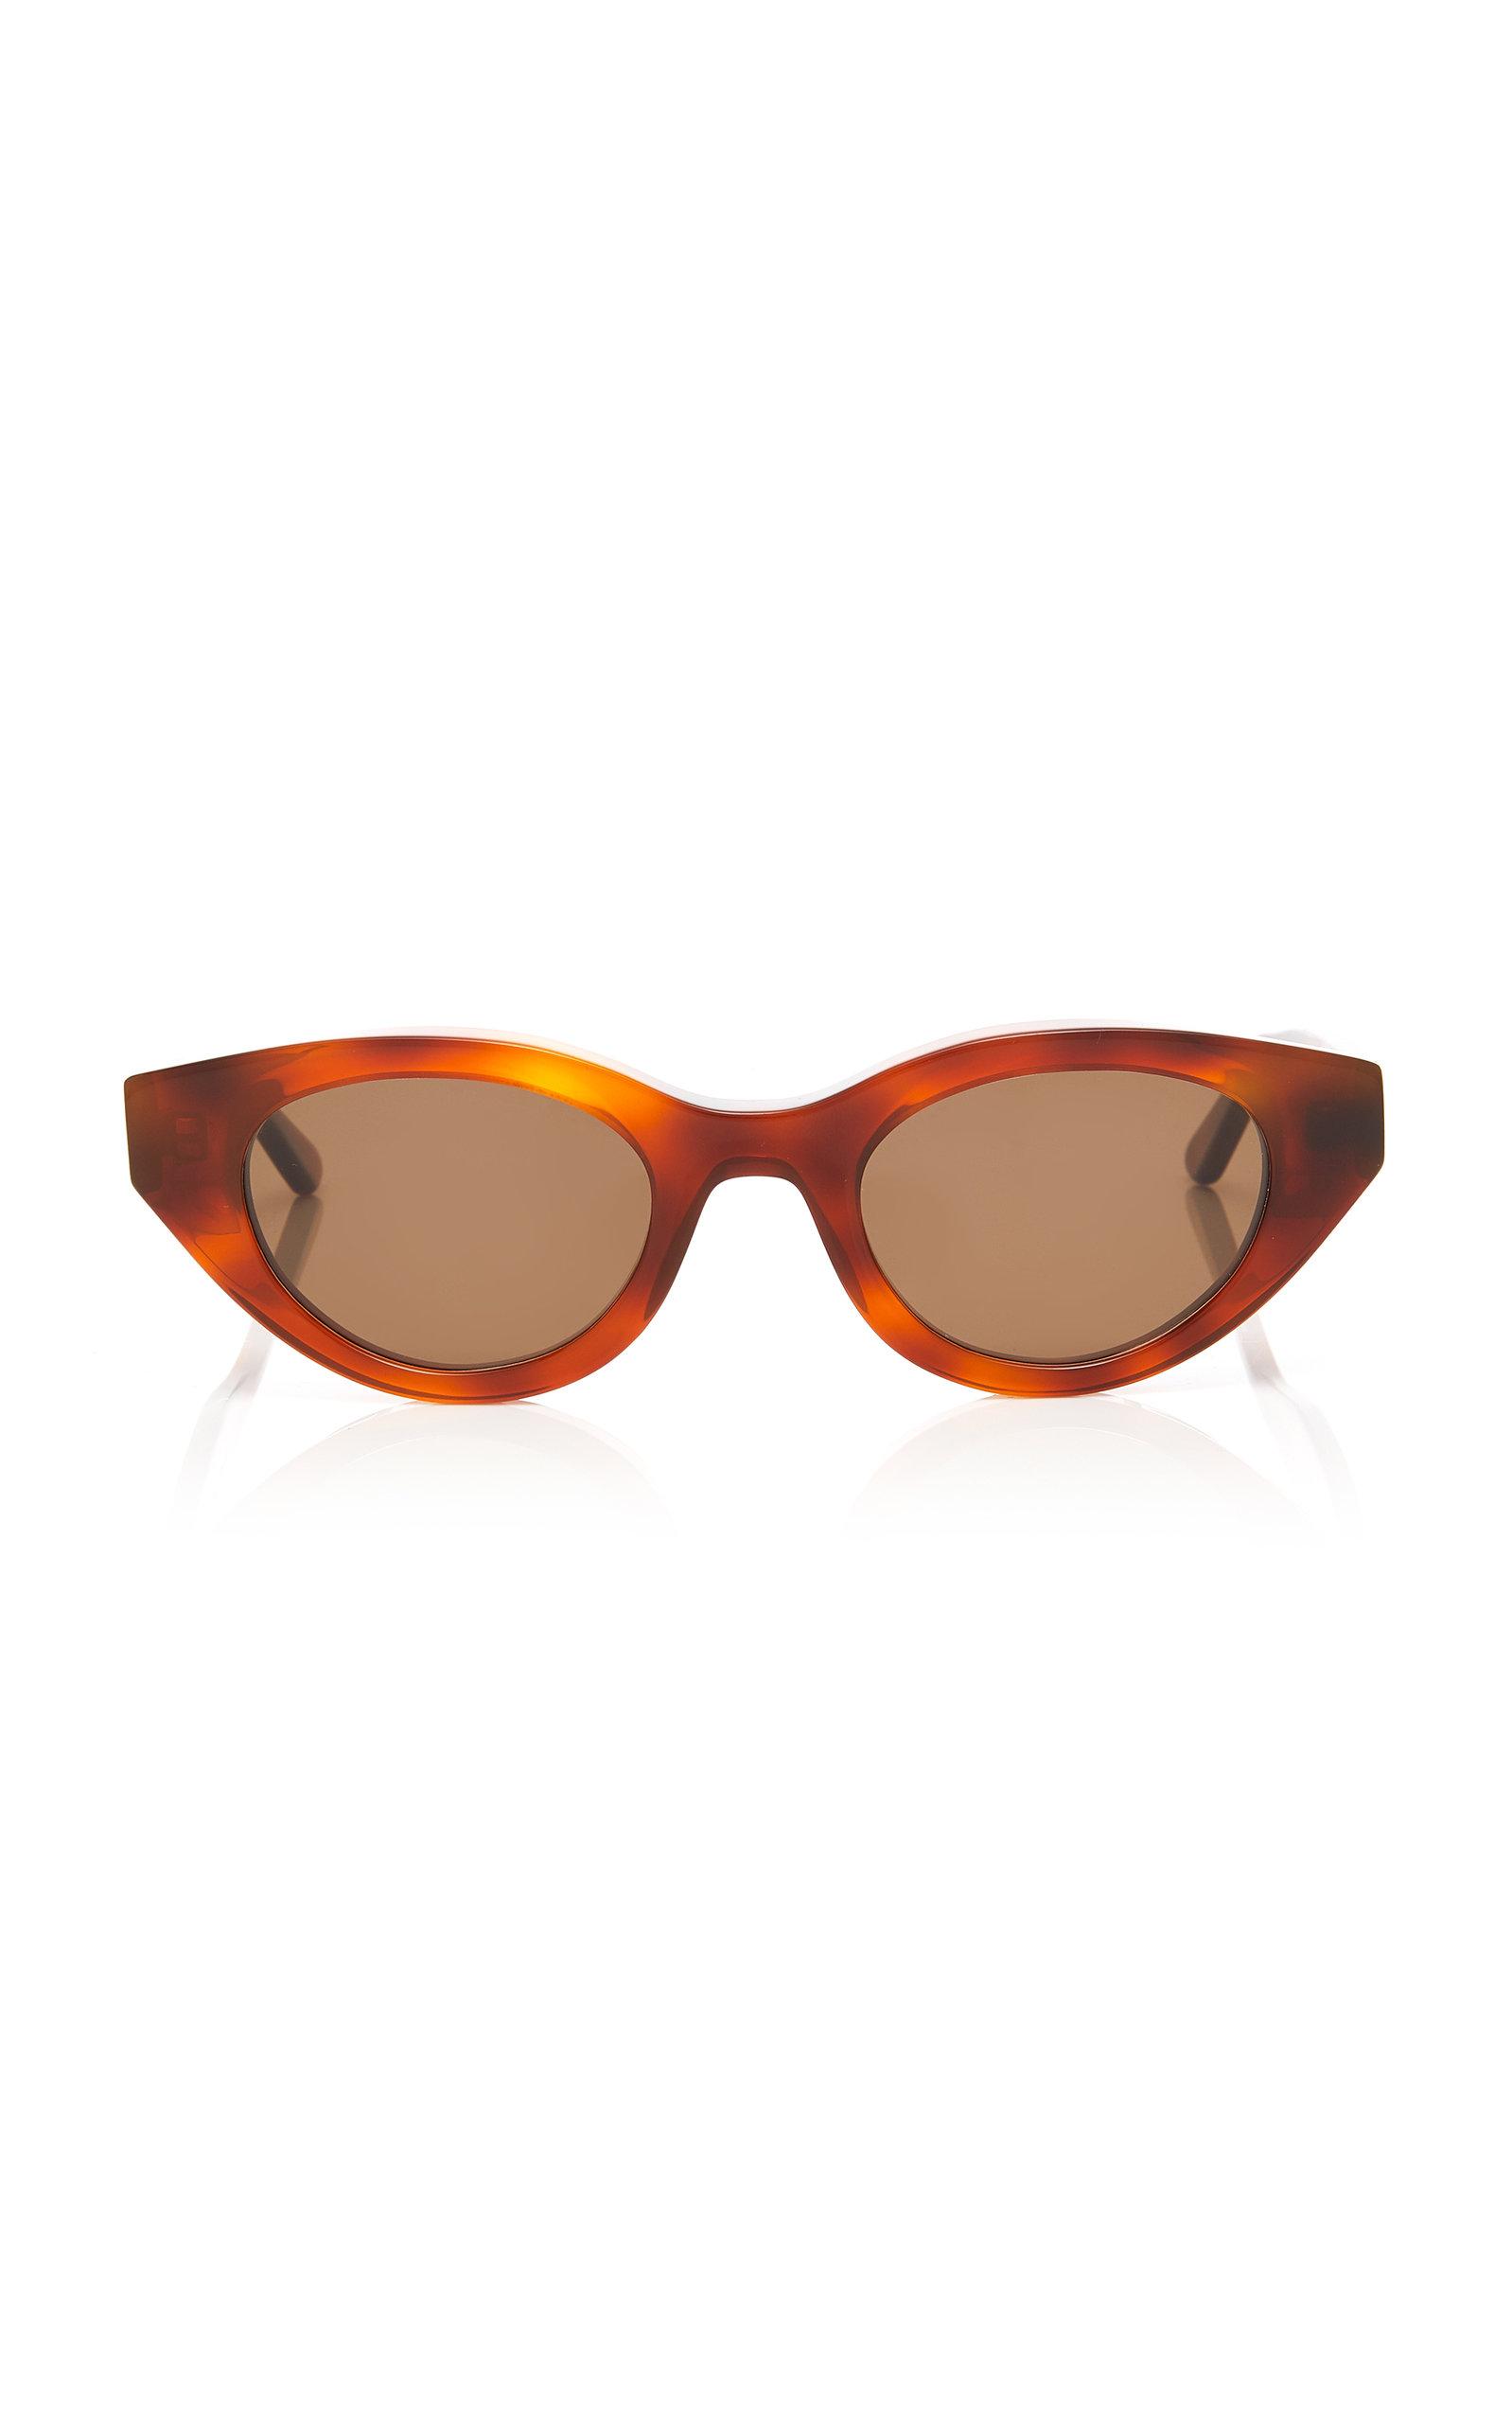 836db08413c0 Thierry LasryAcidity Cat-Eye Tortoiseshell Acetate Sunglasses. CLOSE.  Loading